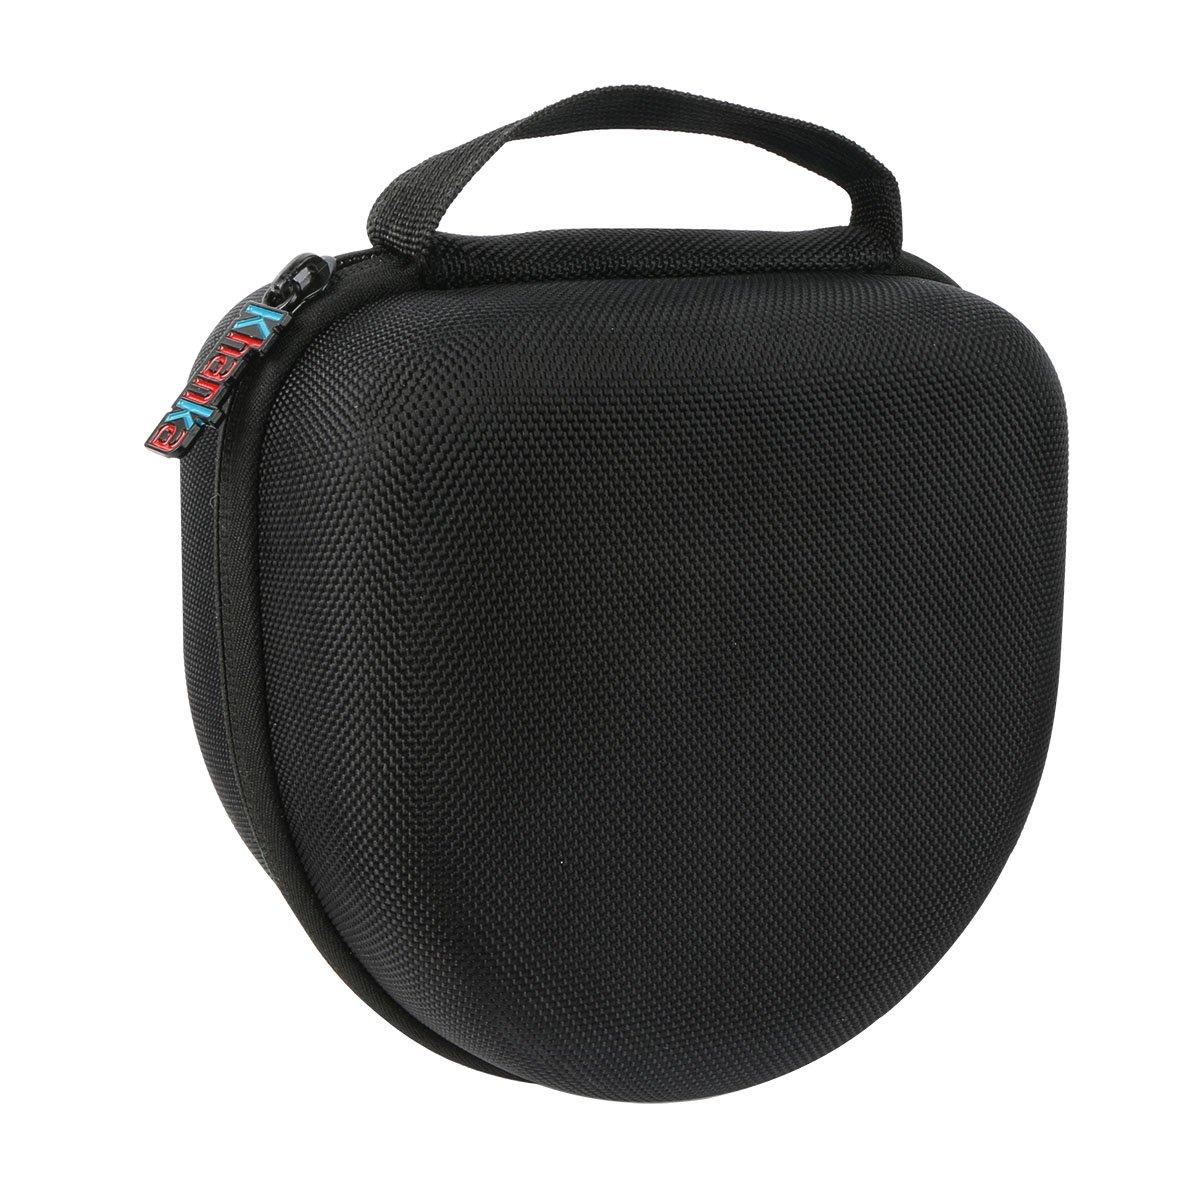 Khanka EVA Carrying Storage Travel Hard Case Cover Bag for Howard Leight Impact Sport OD Electric Folding Earmuff Ear Muffs and Howard Leight Genesis Glasses - Black